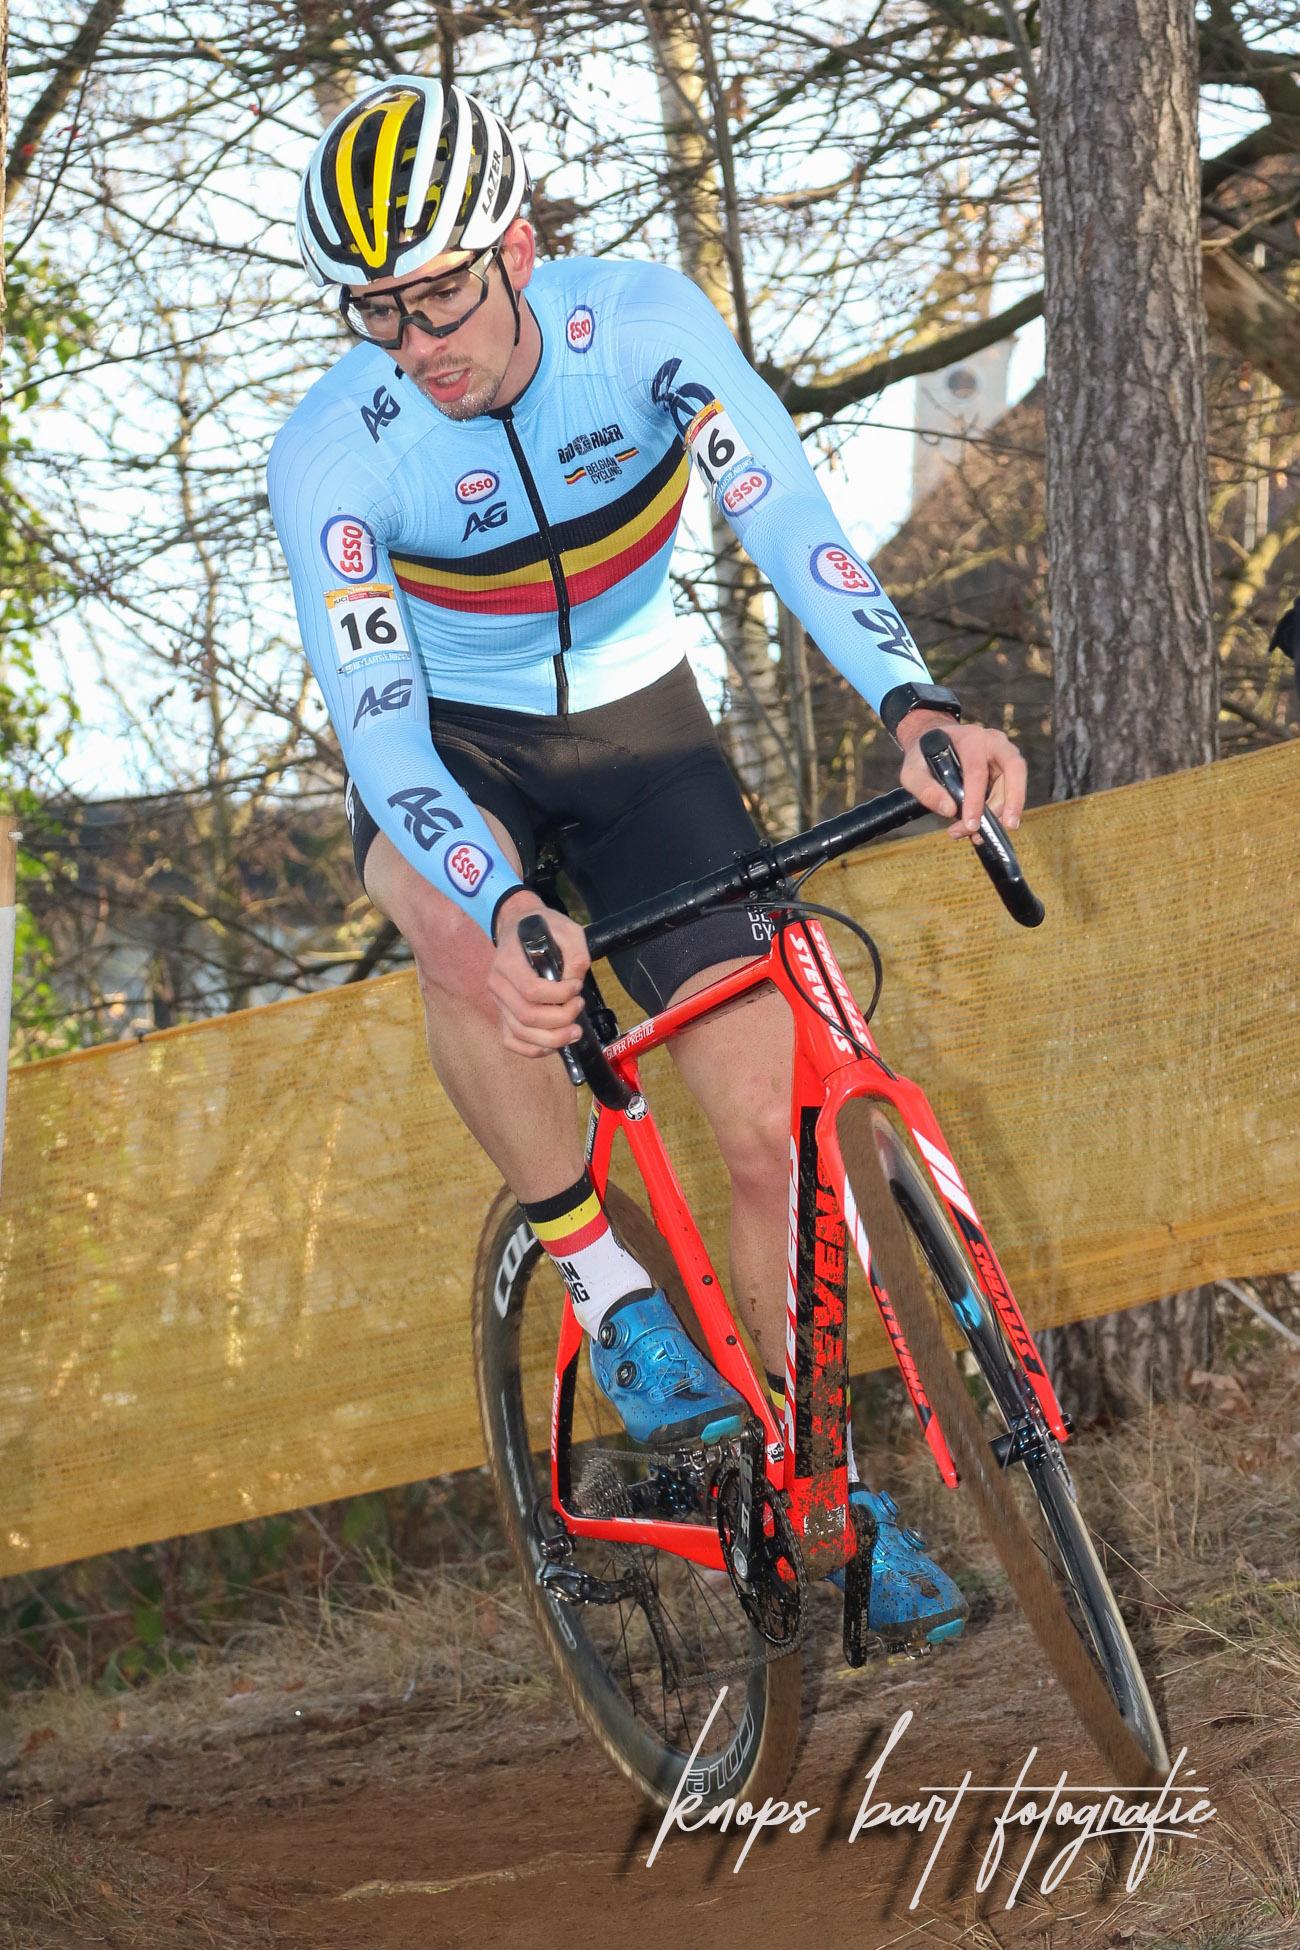 Ryan Cortjens feest nu ook in wereldbekercross Zolder